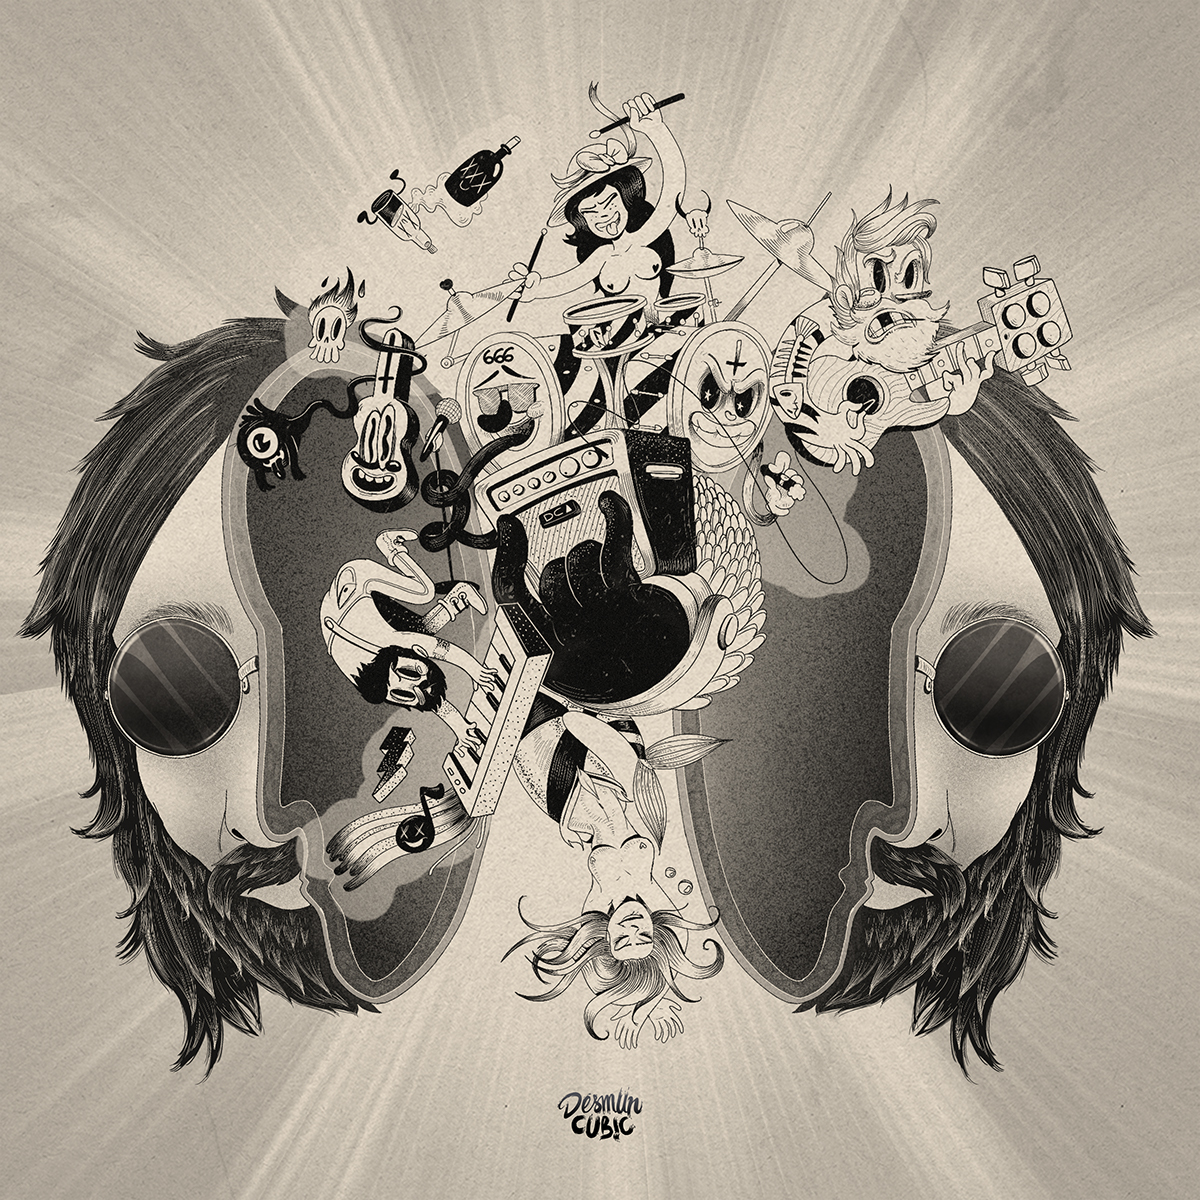 mcbess ugo gattoni old cartooon Classic disney Fleischer Studios black and white music rock Absolut vodka